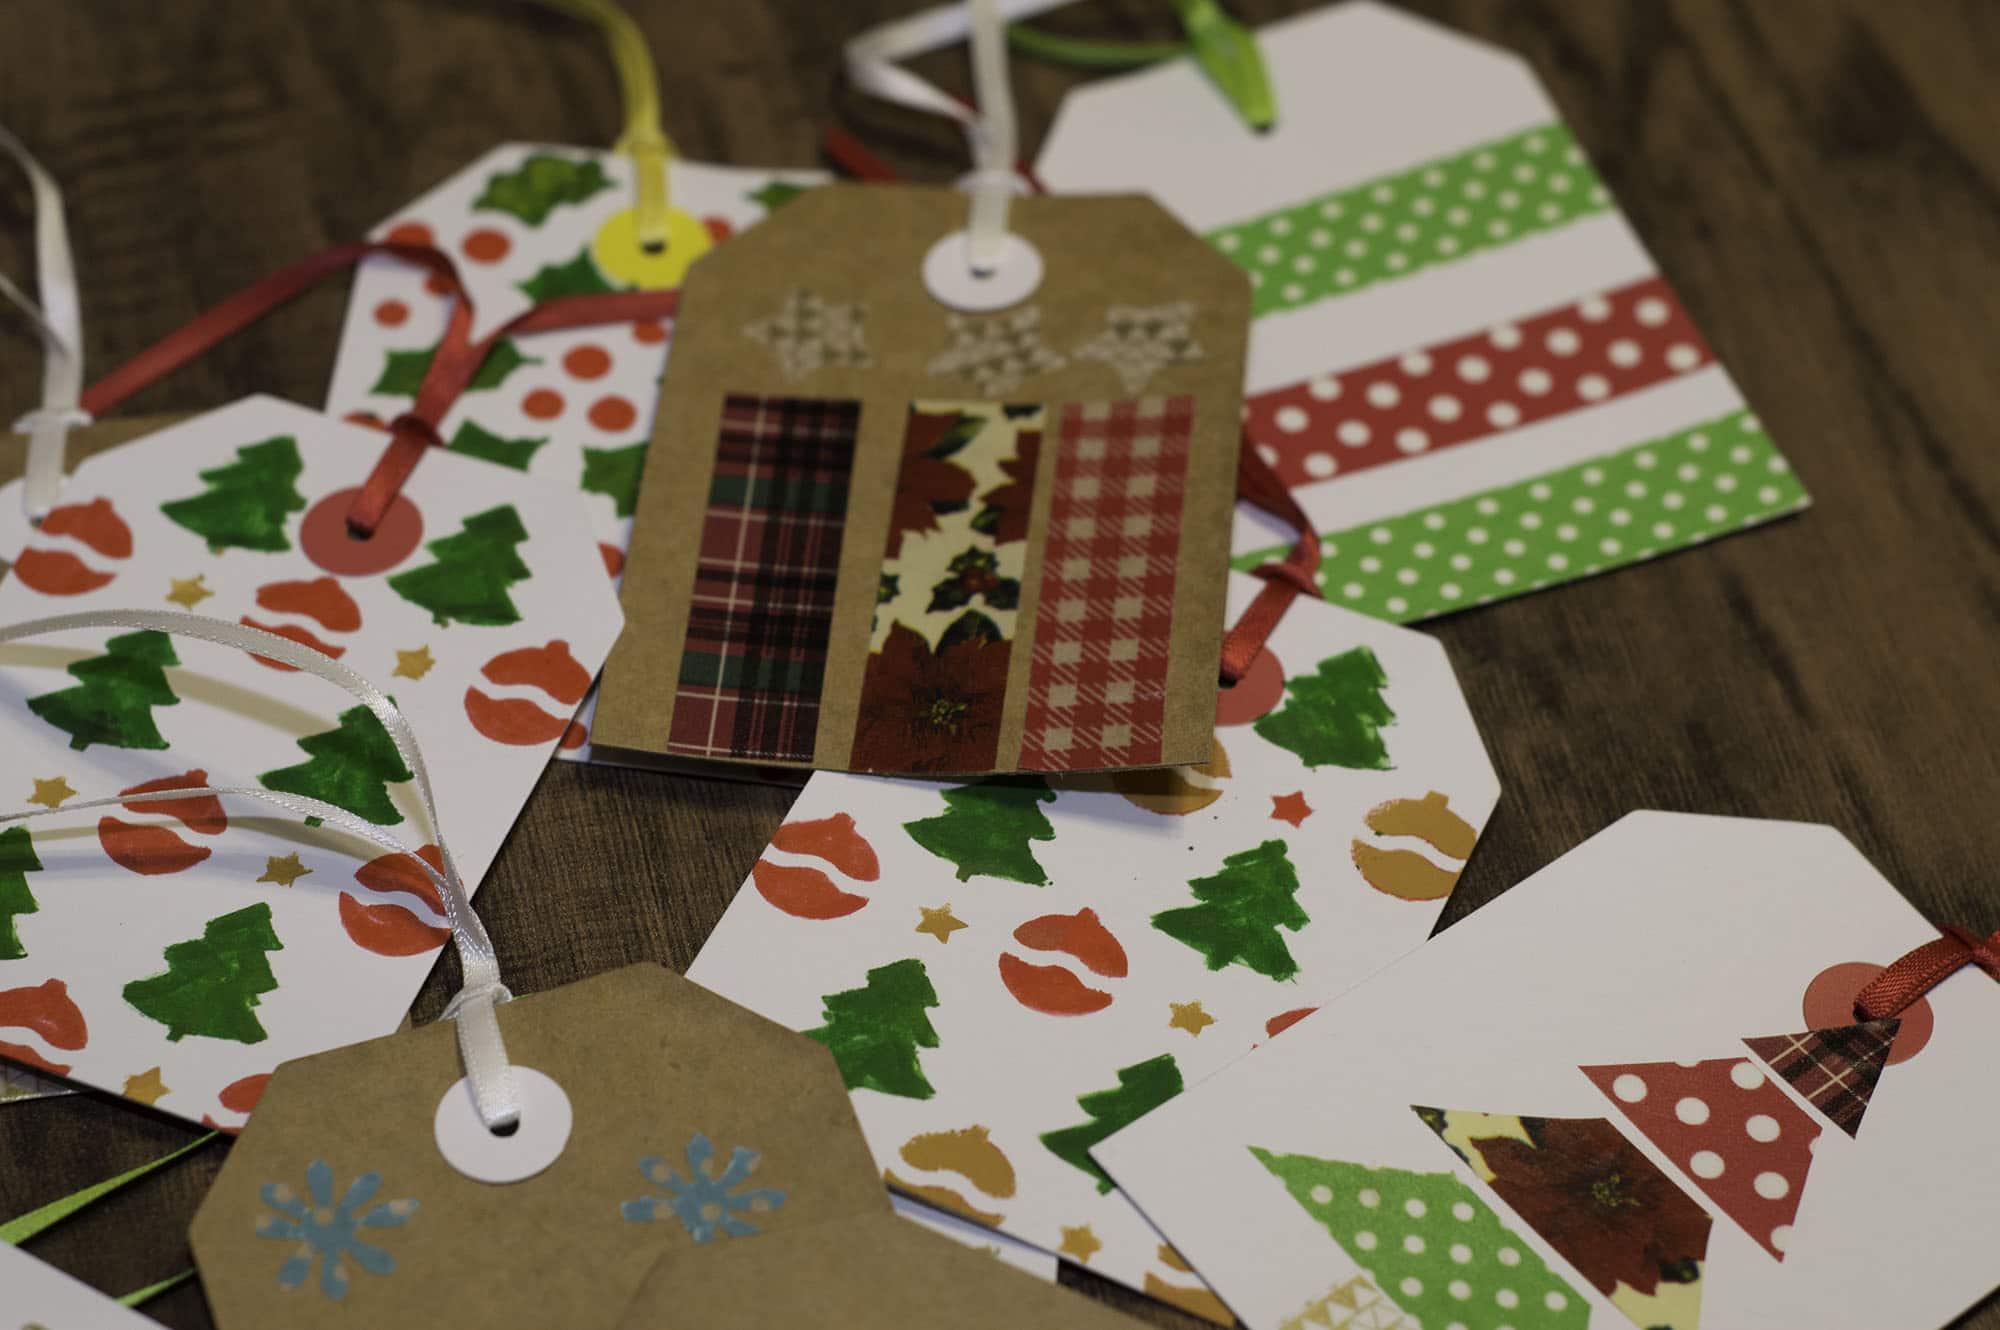 Christmas Gift Tags To Make.Super Simple Christmas Gift Tags To Make Sew Very Crafty